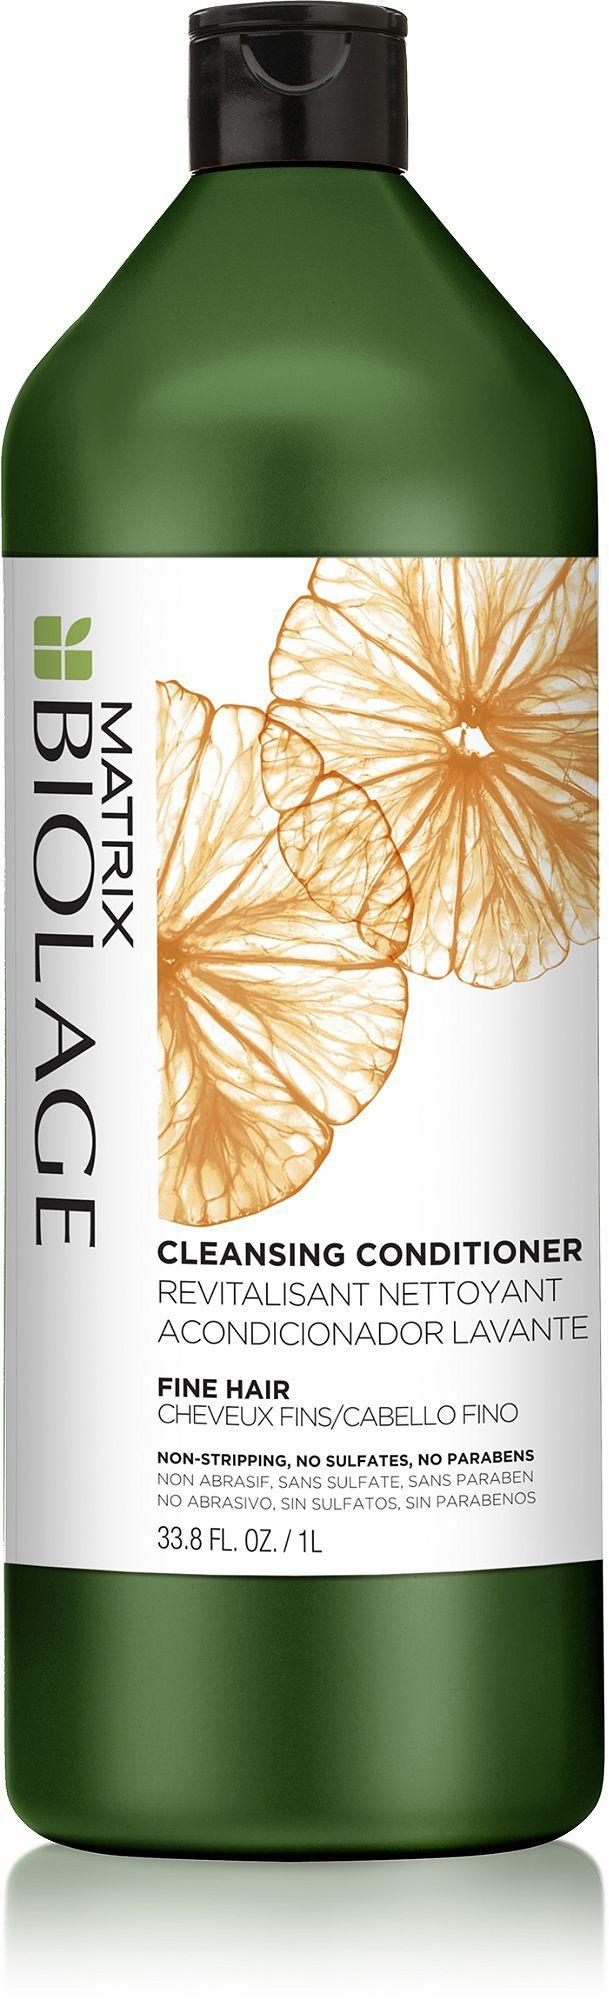 Matrix Biolage Cleansing Conditioner For Fine Hair 1000ml,